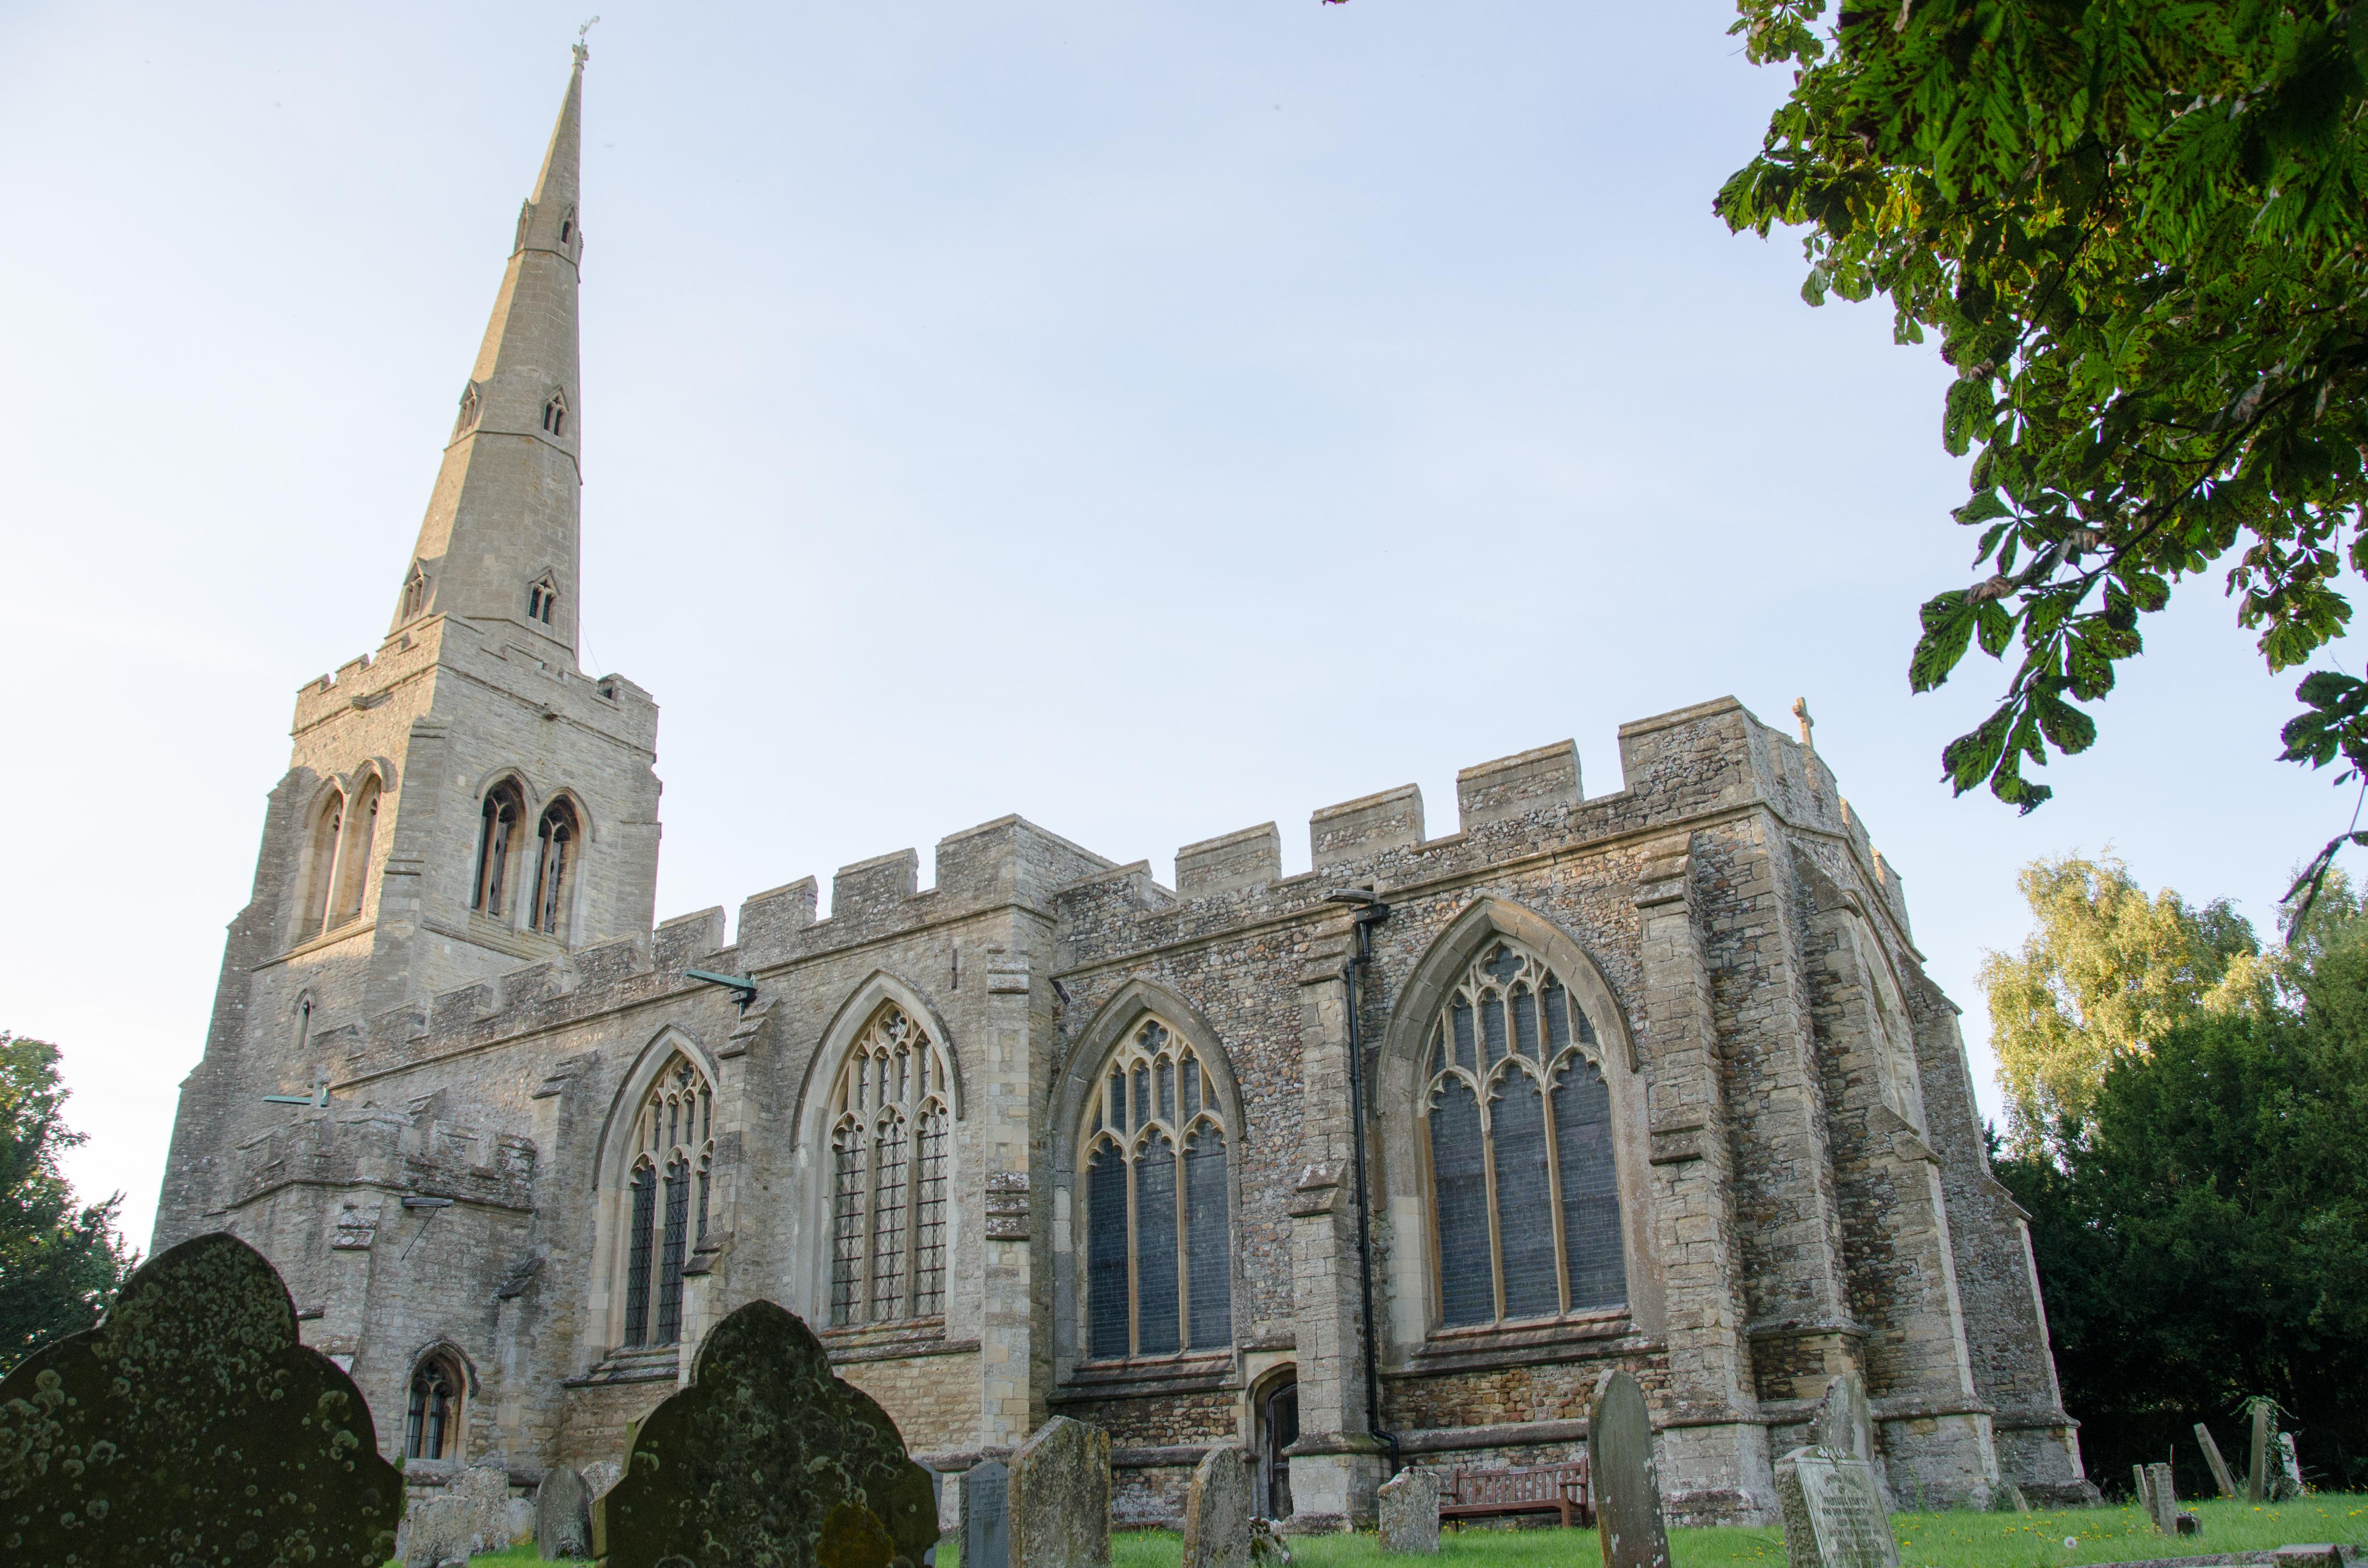 File:Colmworth St Denys Church 1 jpg - Wikimedia Commons